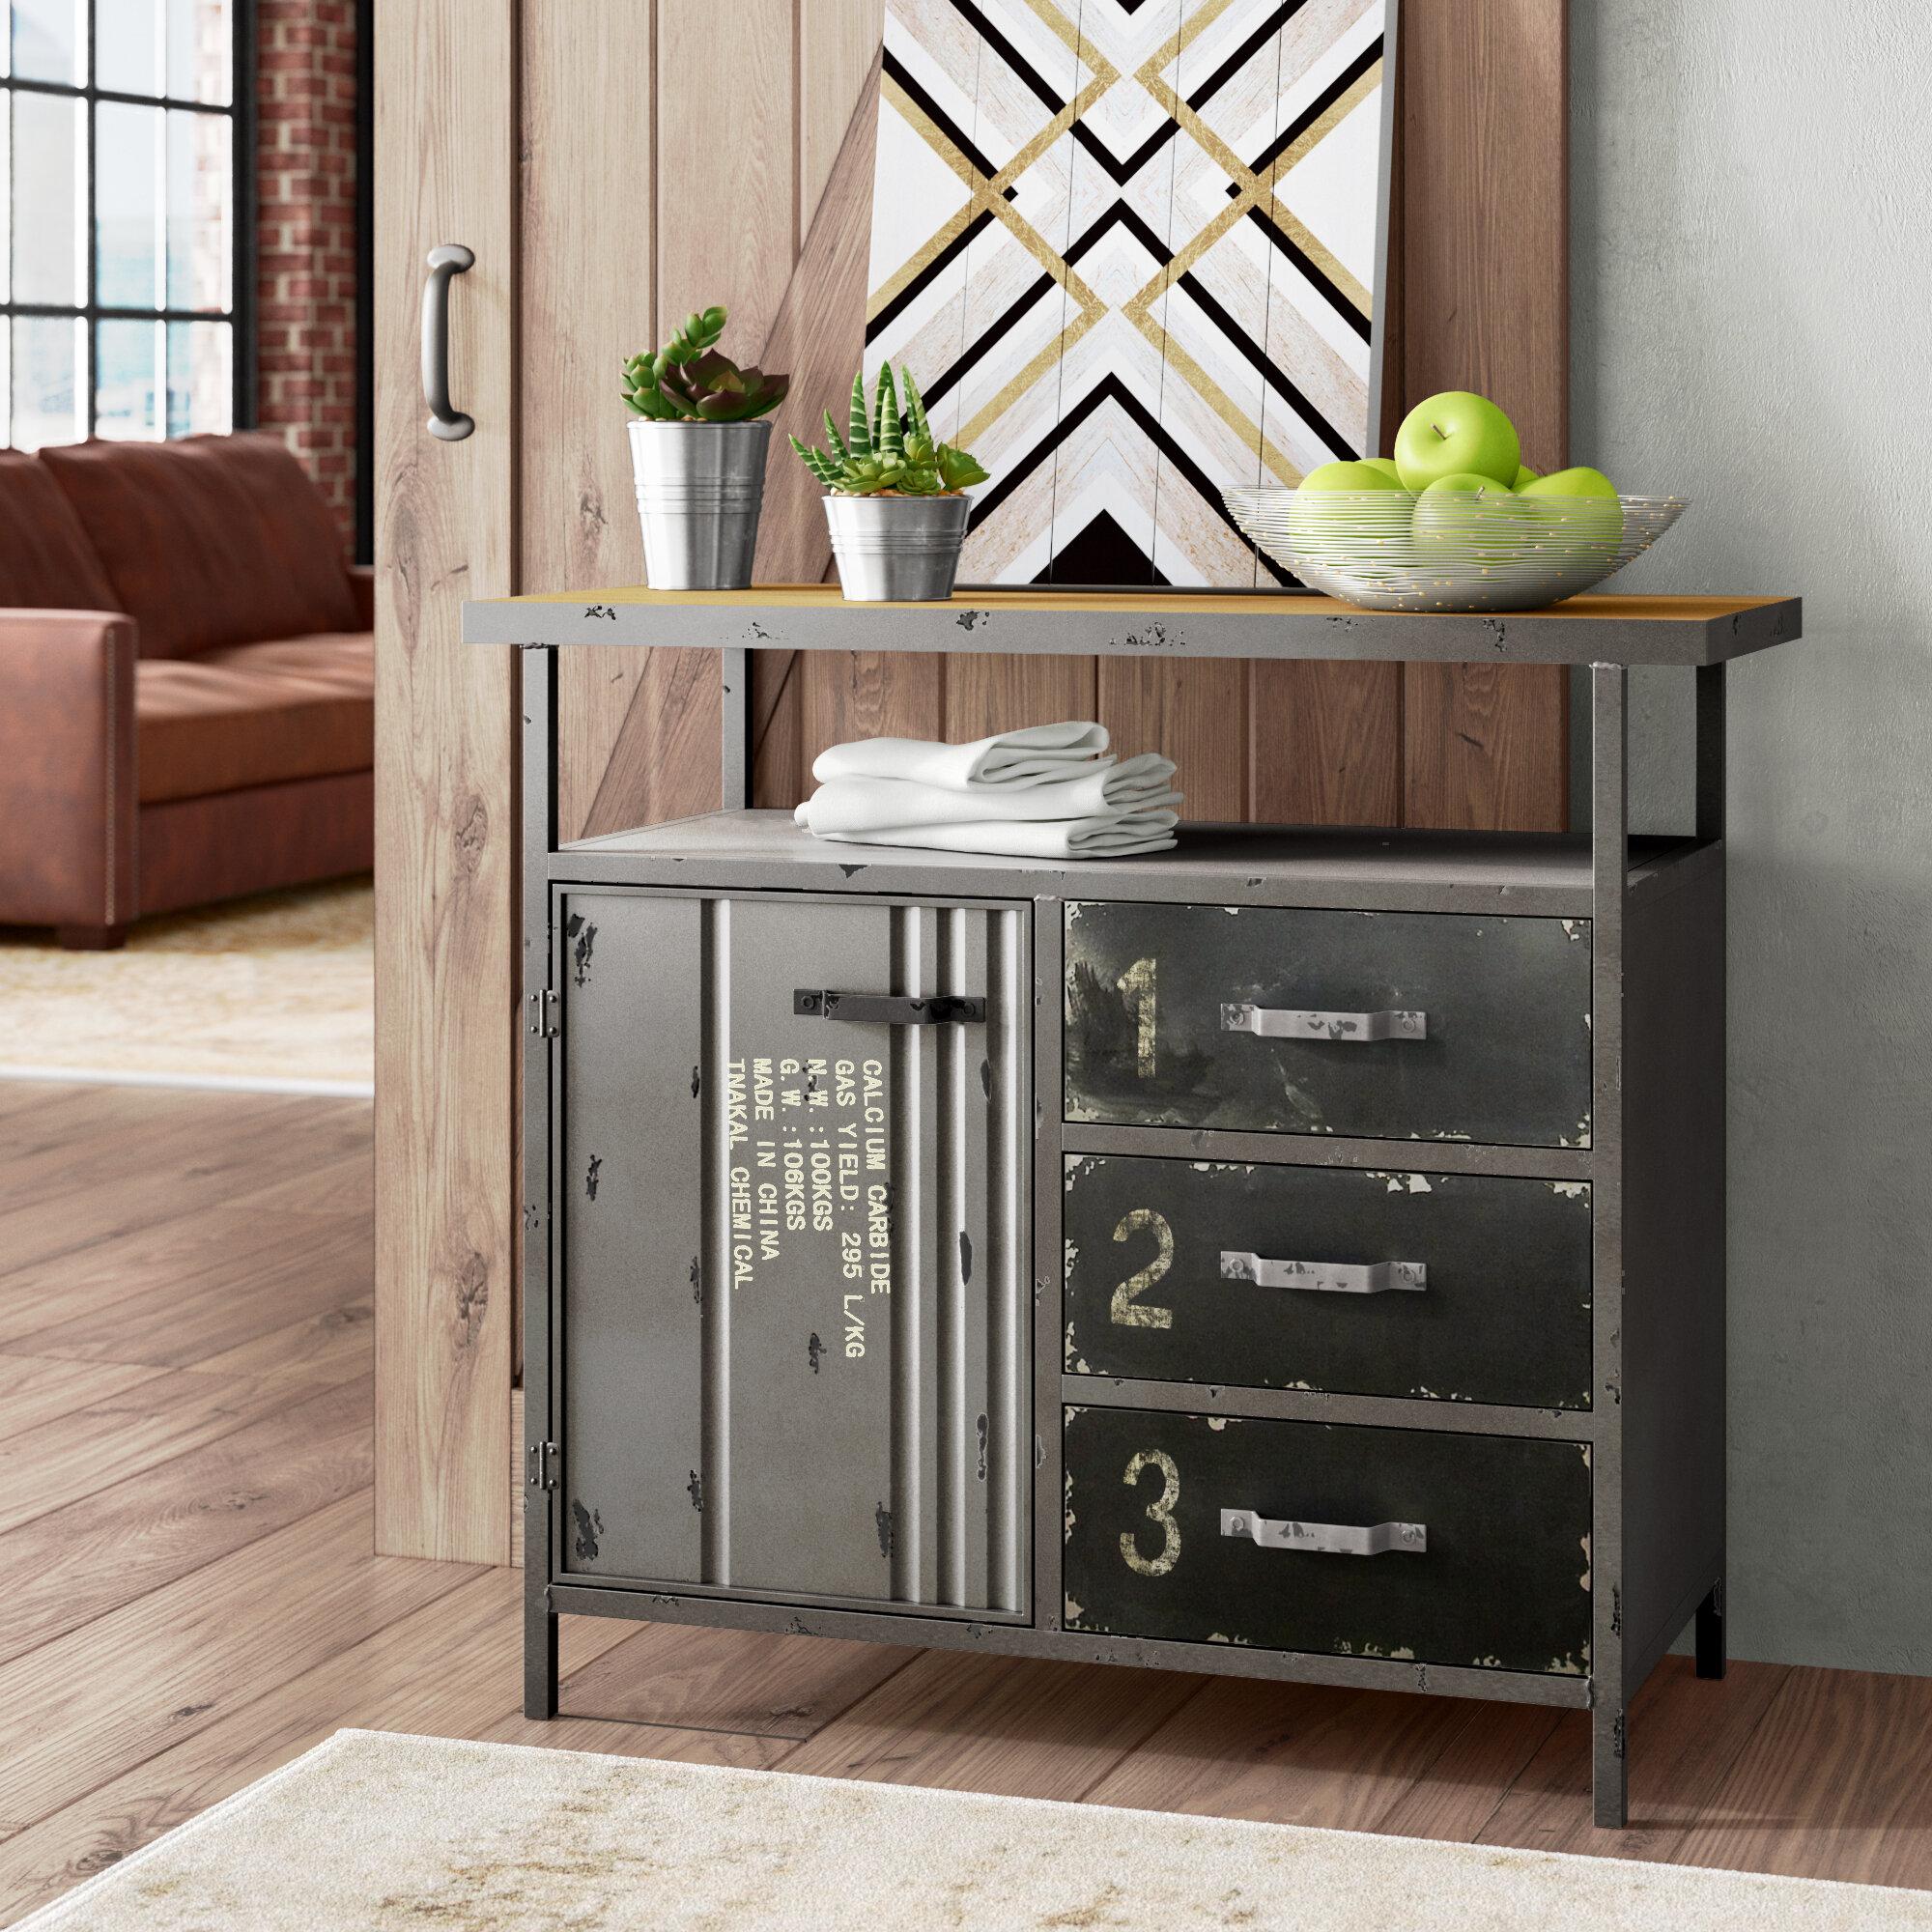 Williston Forge Hartland 1 Door 3 Drawer Metal And Wood Utility Accent  Cabinet U0026 Reviews | Wayfair